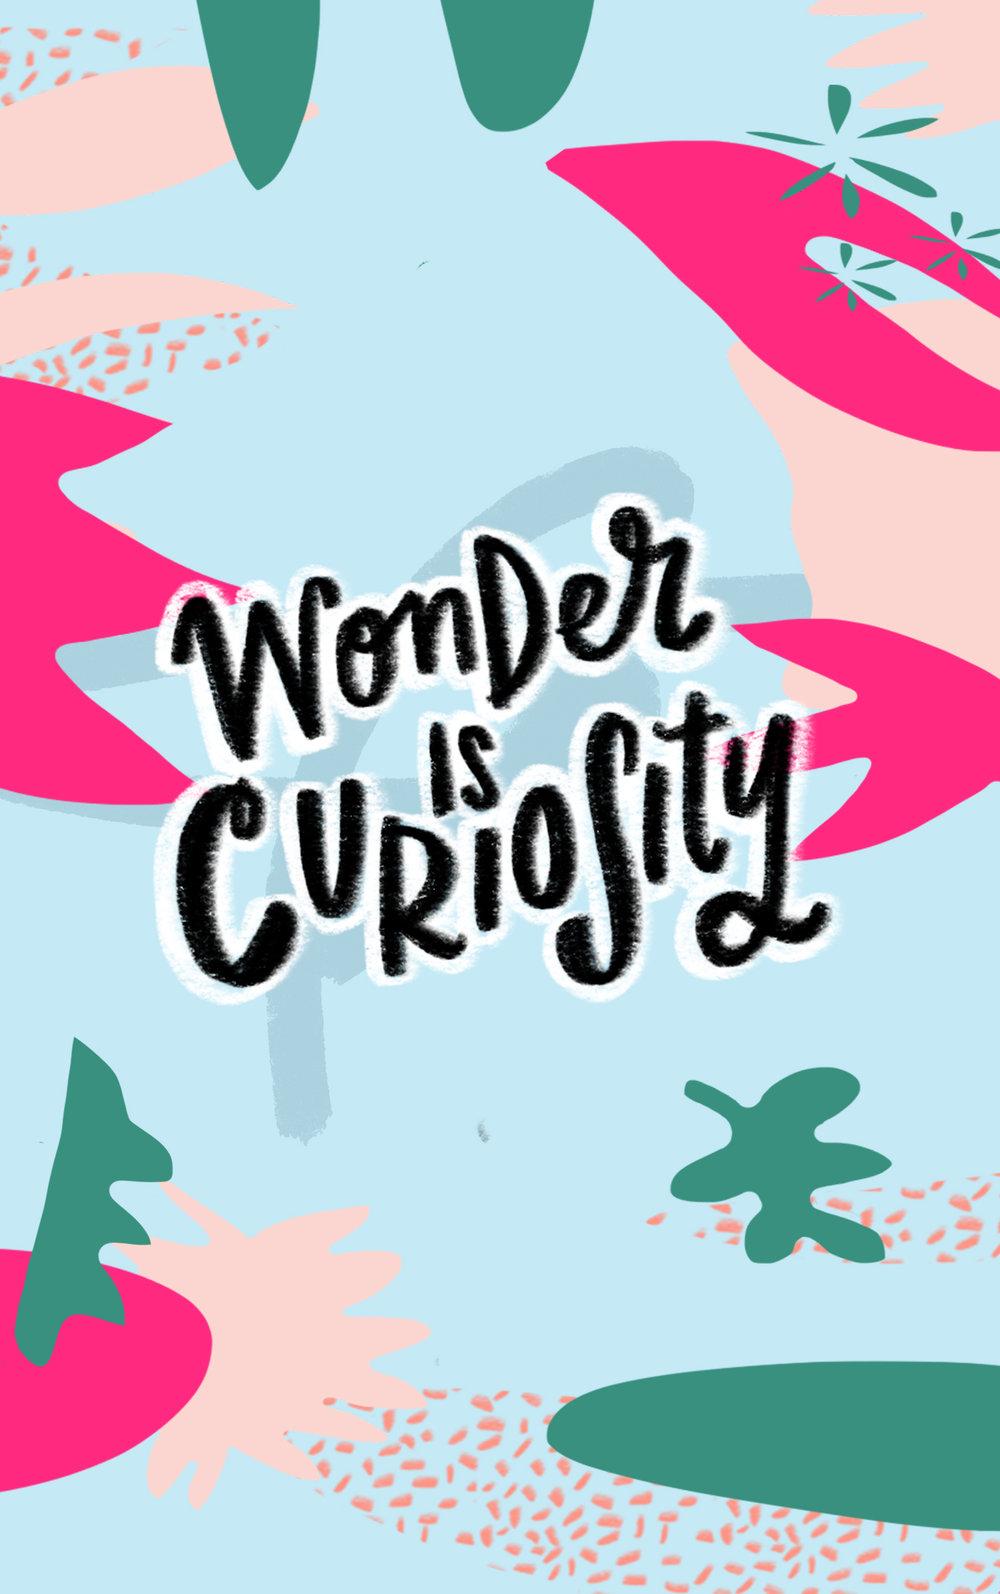 WonderIsCuriosity.jpg